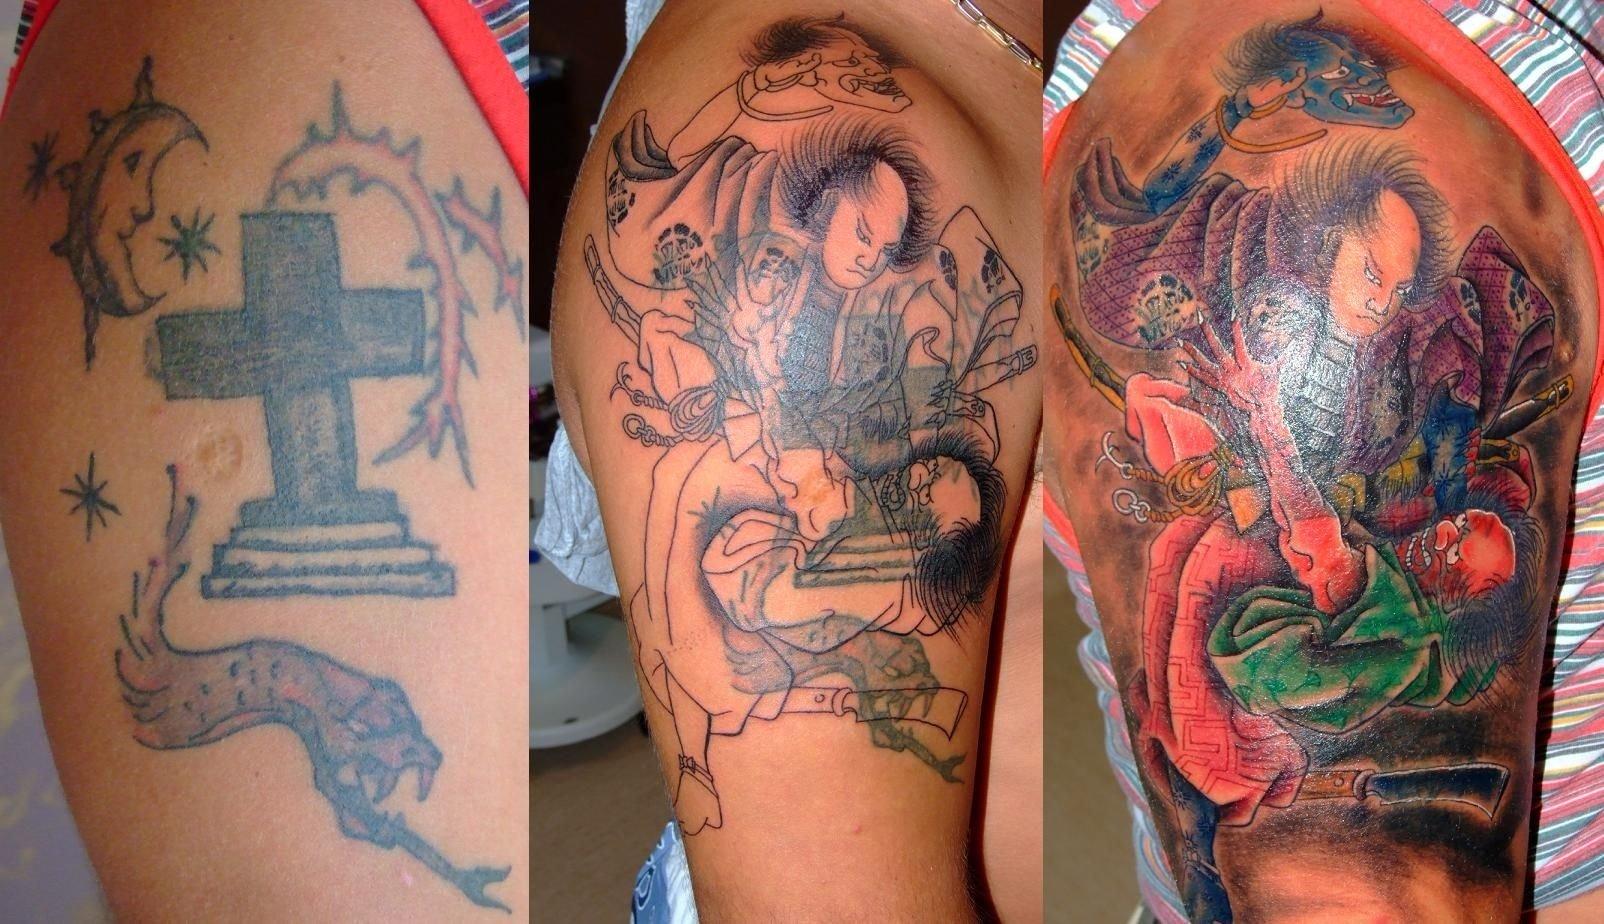 10 Fabulous Cross Tattoo Cover Up Ideas cross cover up tattoo design tattoo ideas 2015 pinterest 2021